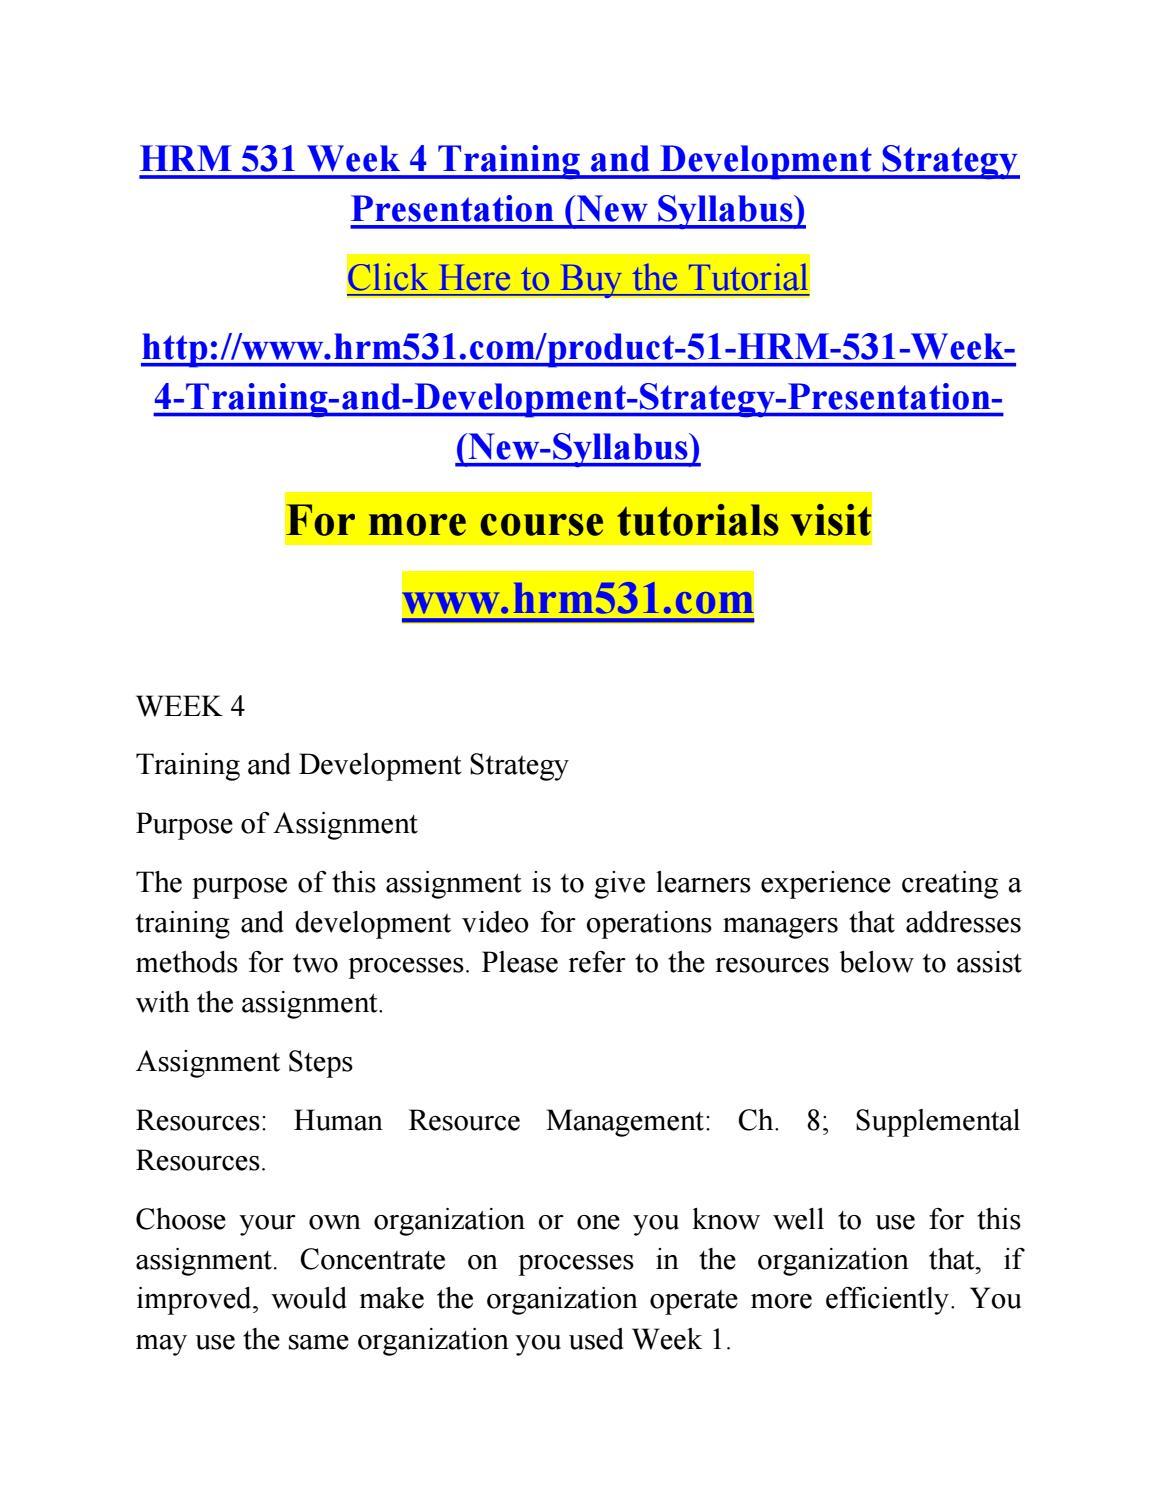 dissertation proposal corporate governance